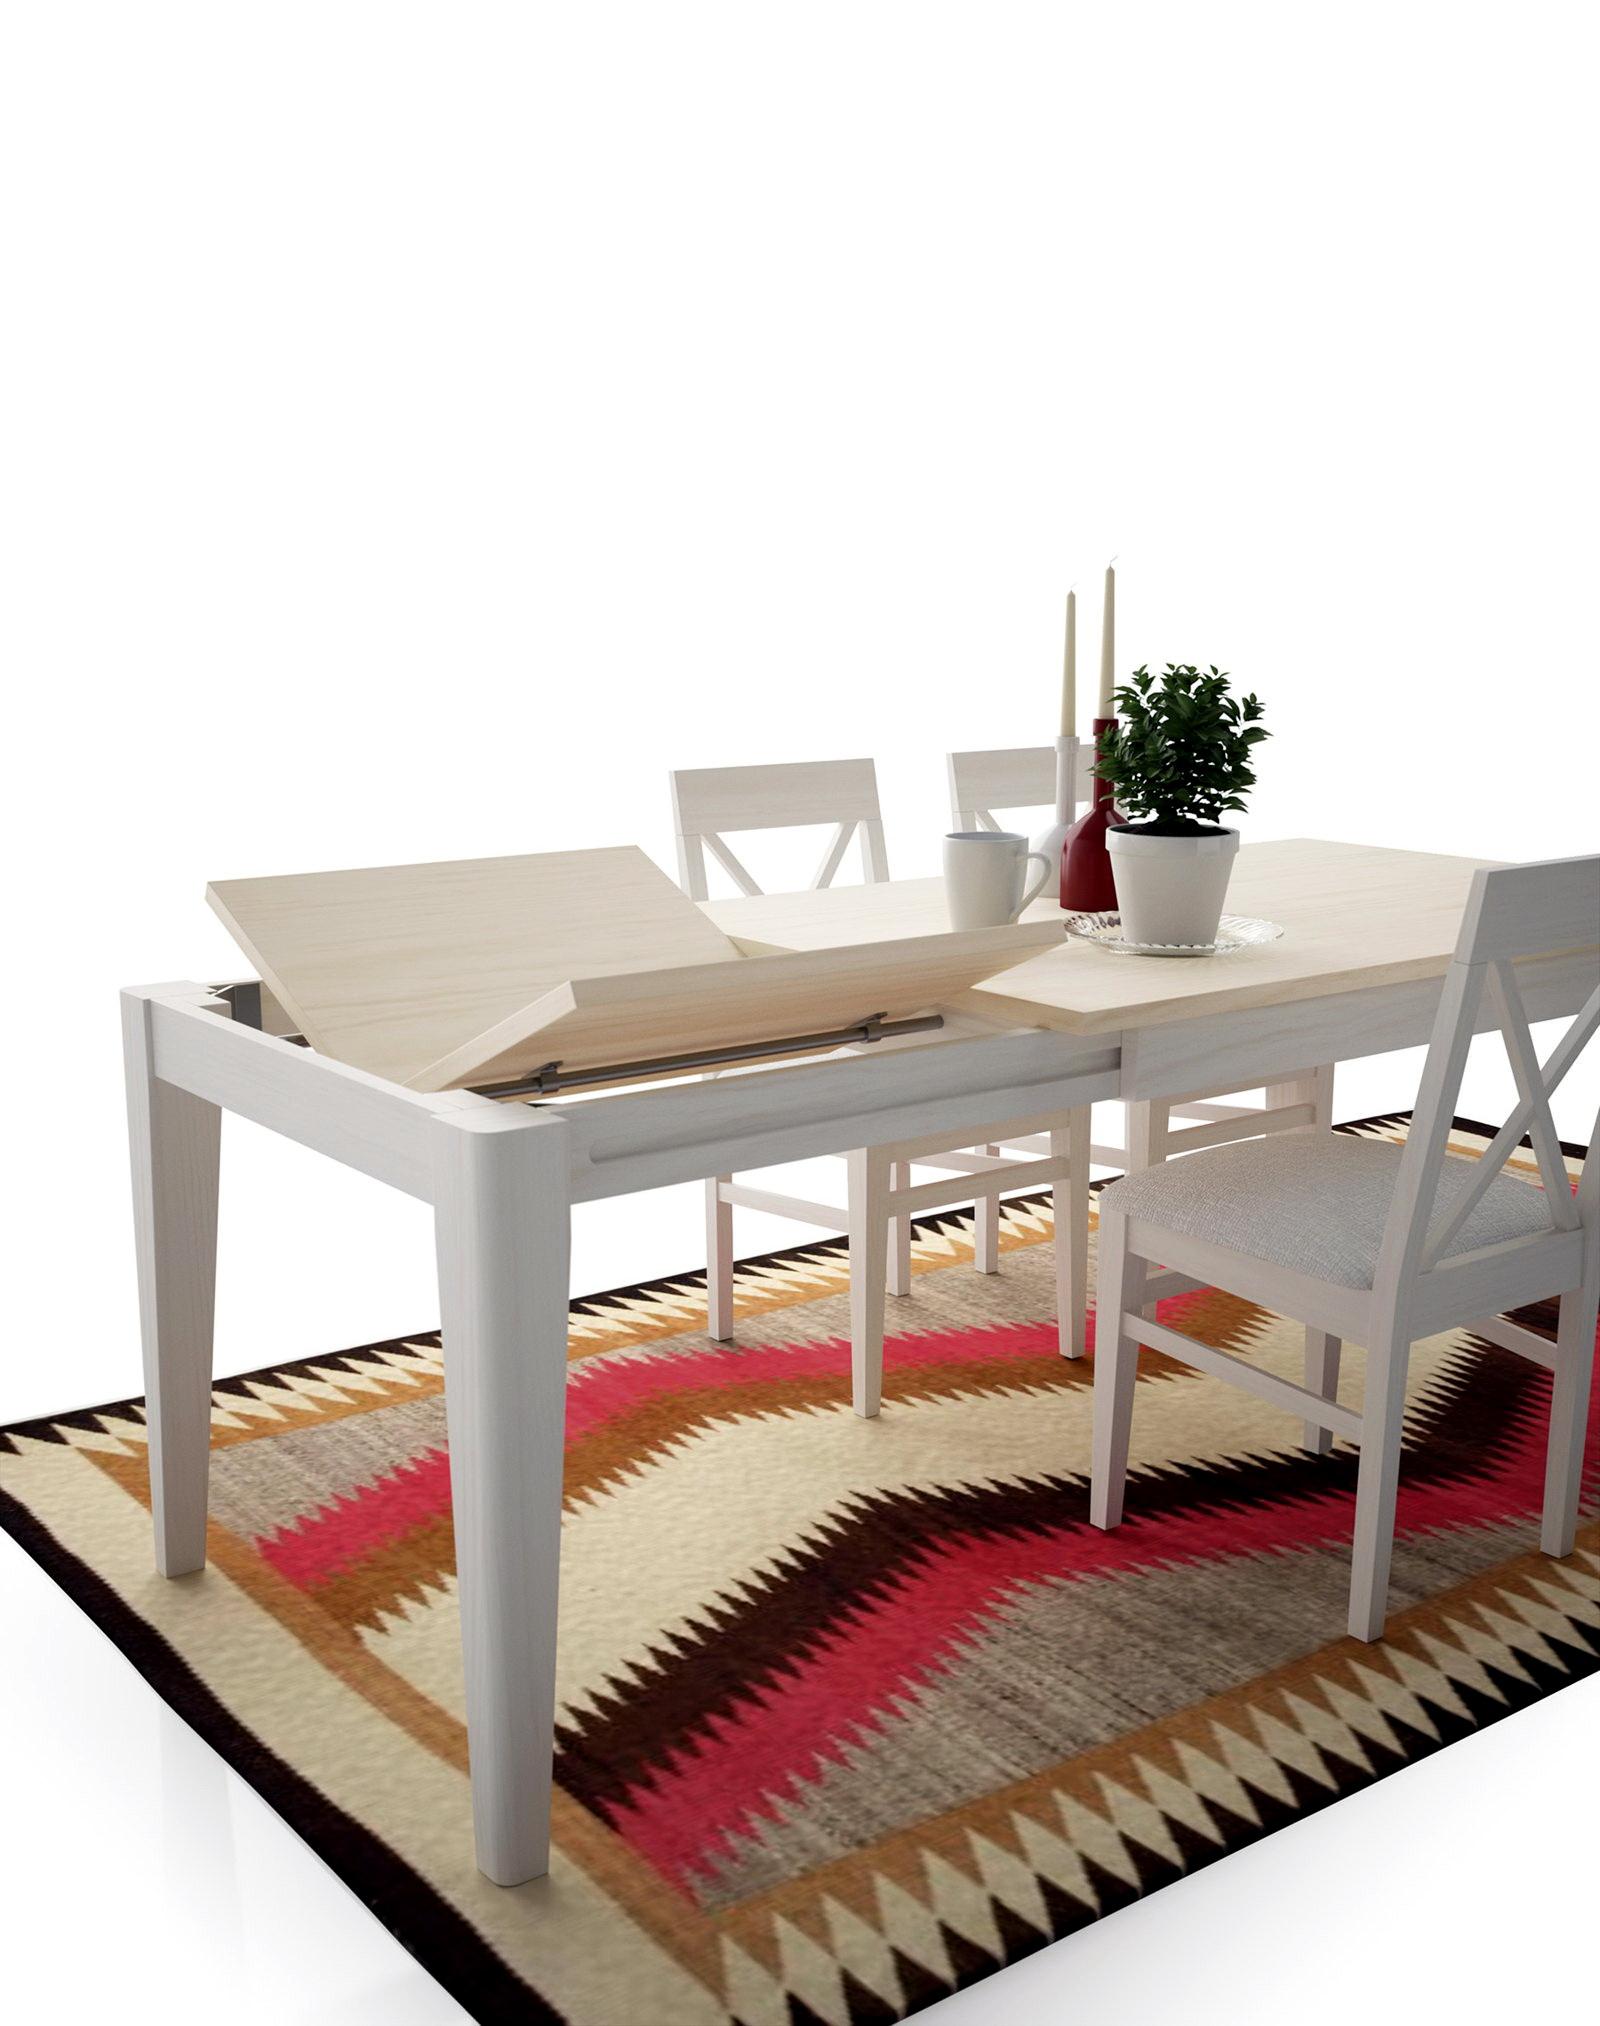 Mesas comedor madera arenada by Grupo Seys - Muebles ANTOÑÁN